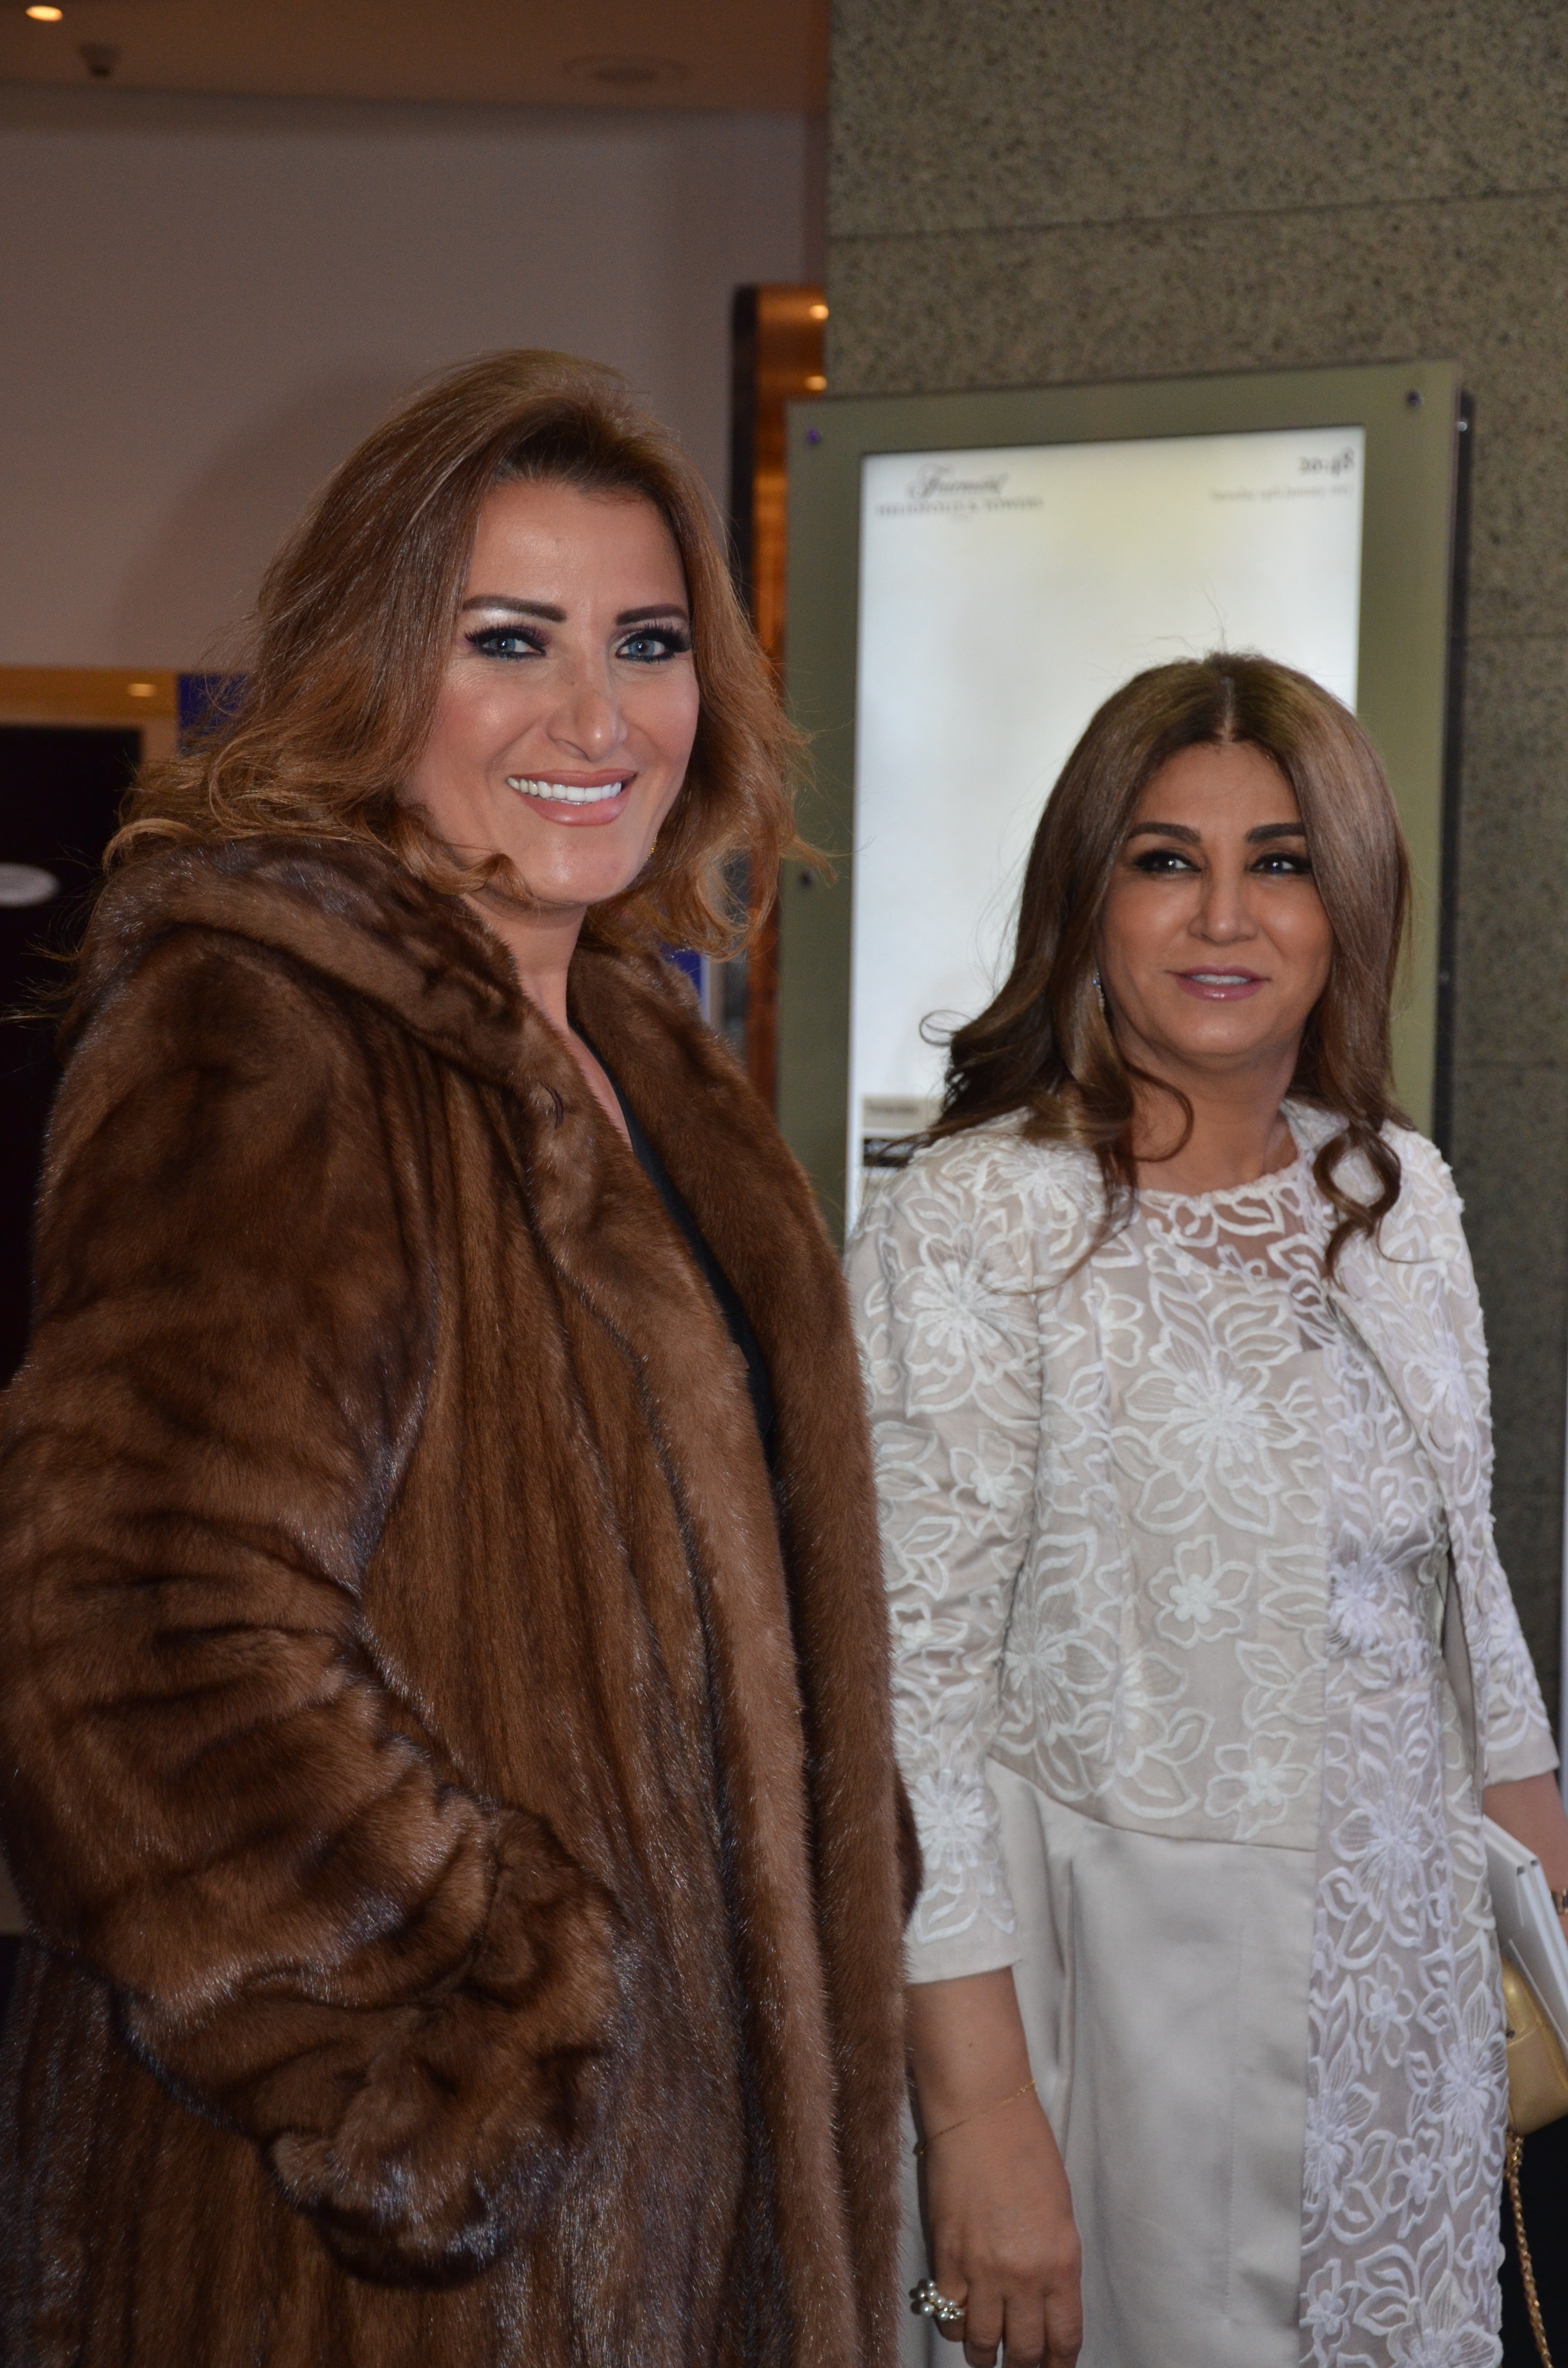 Shahinaz Khairy and Nagat El Shohdi